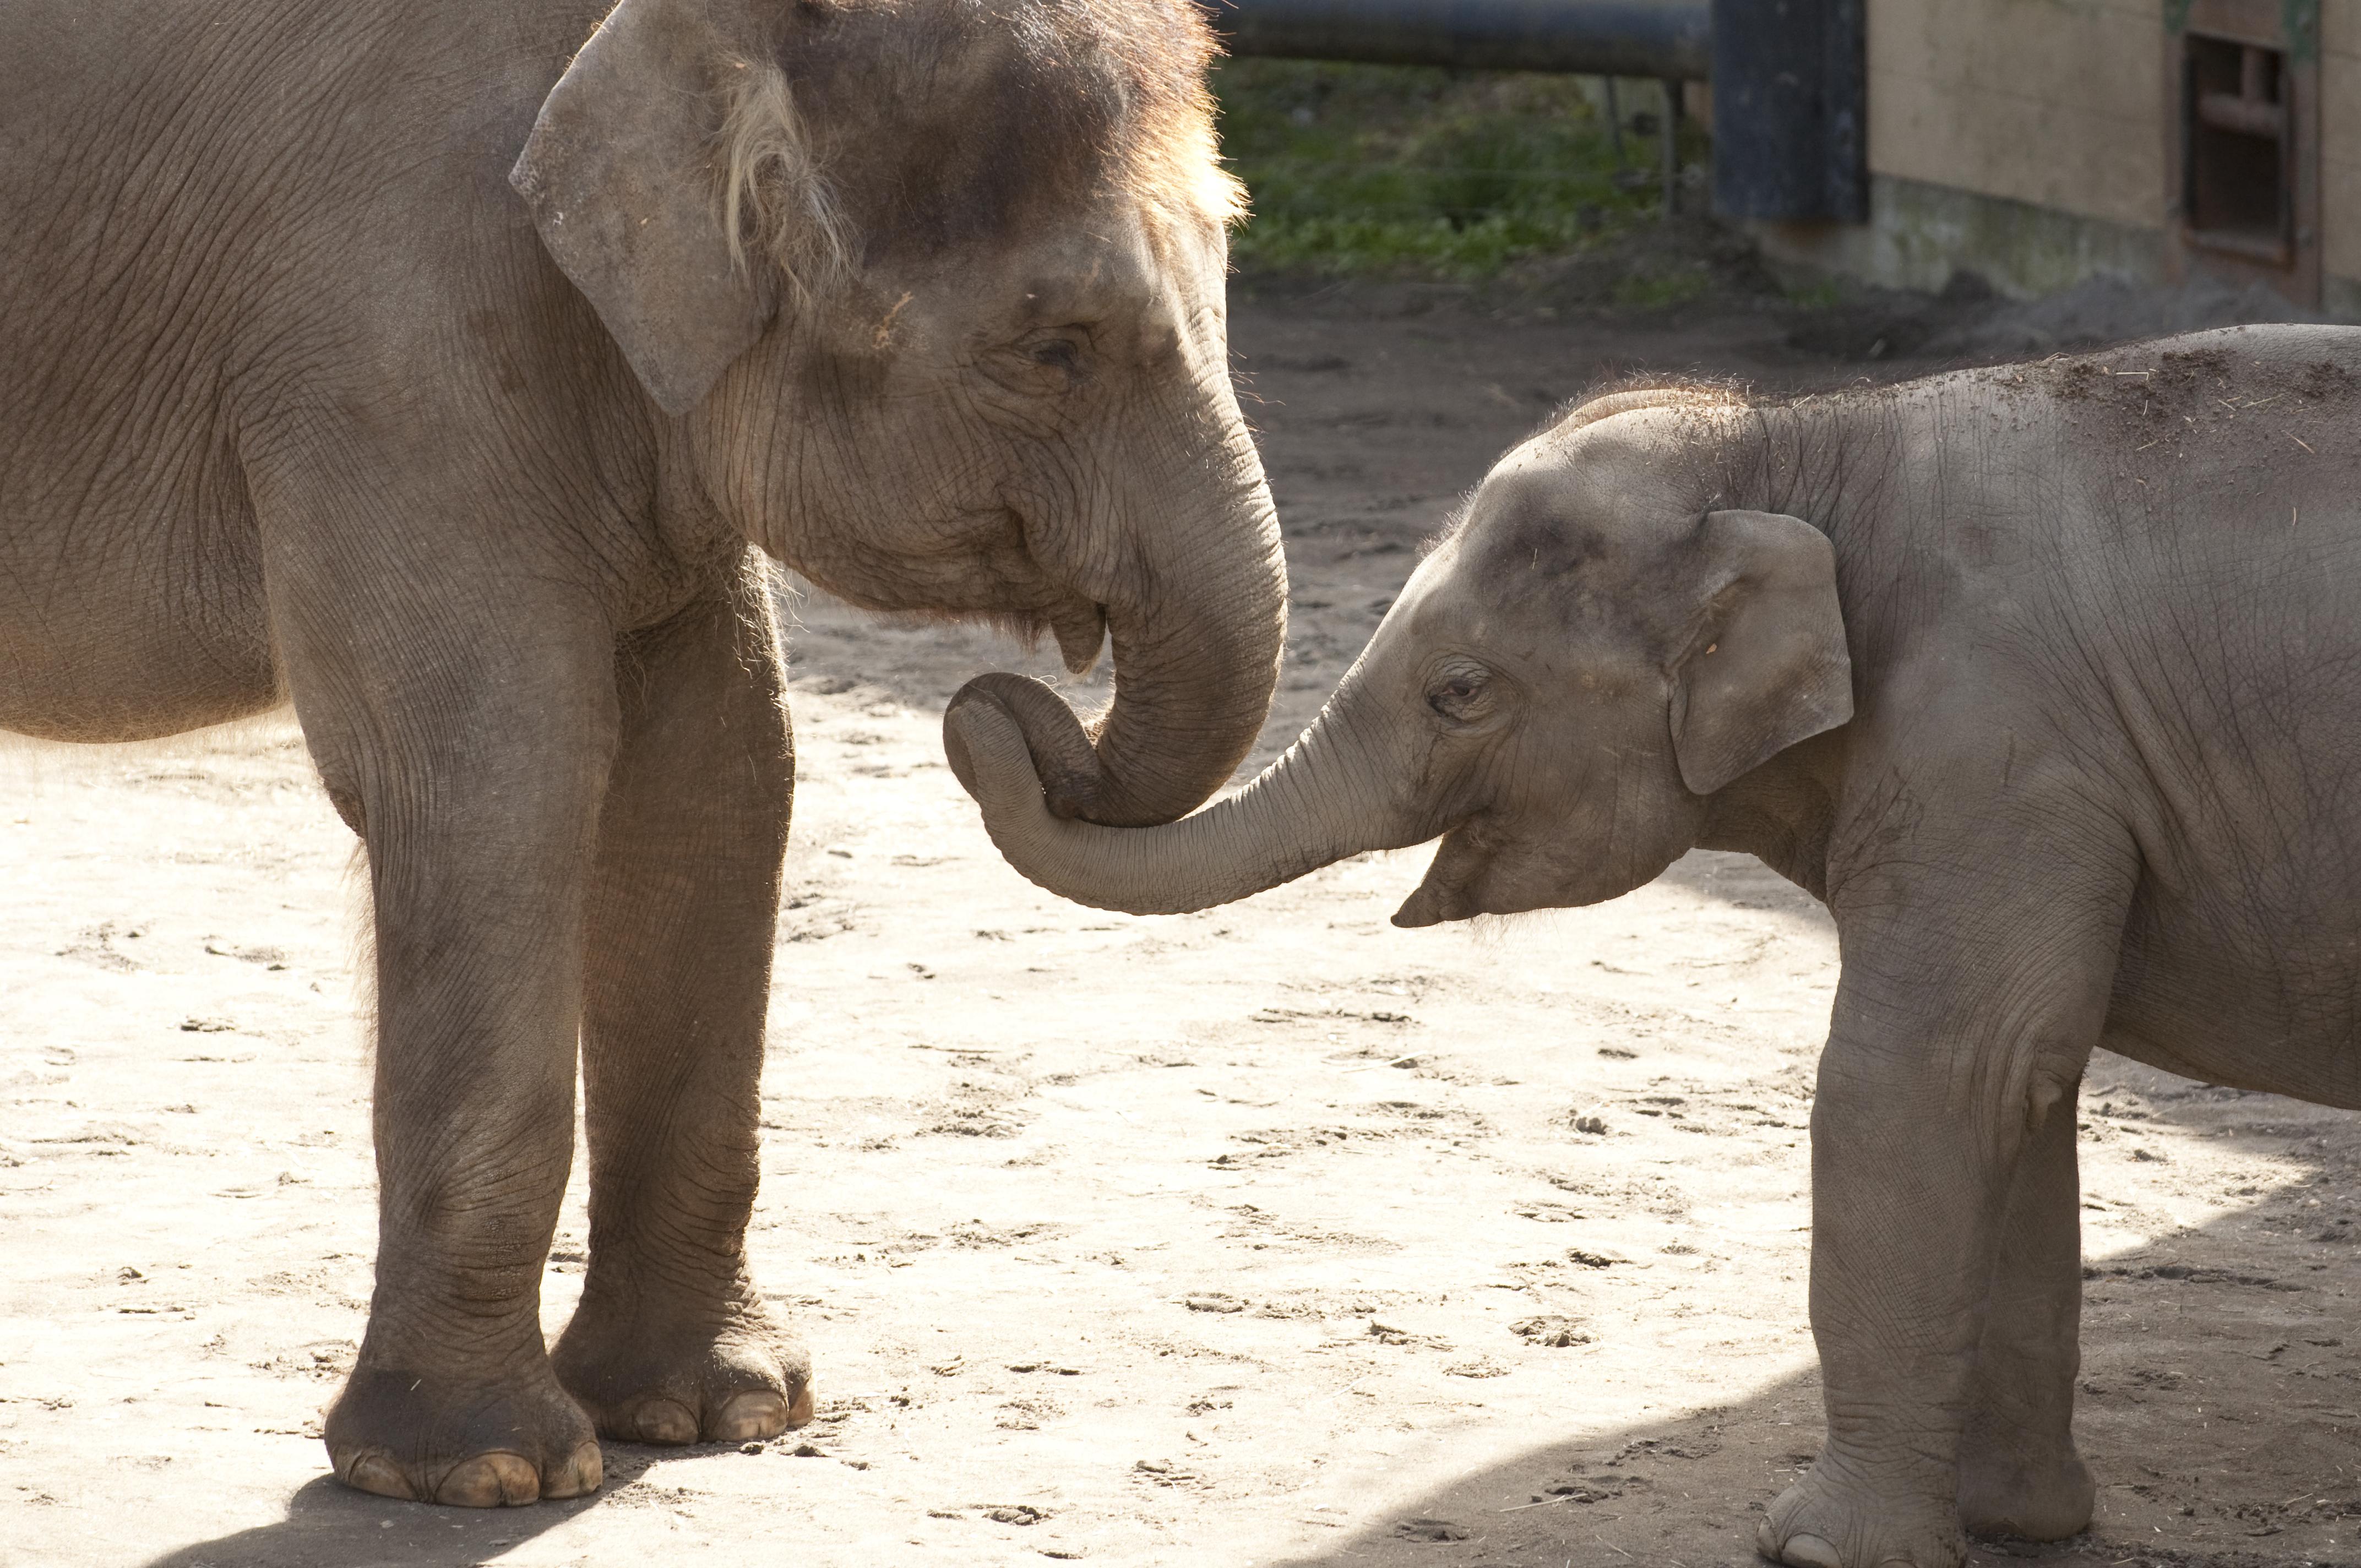 Tags: Asian Elephant